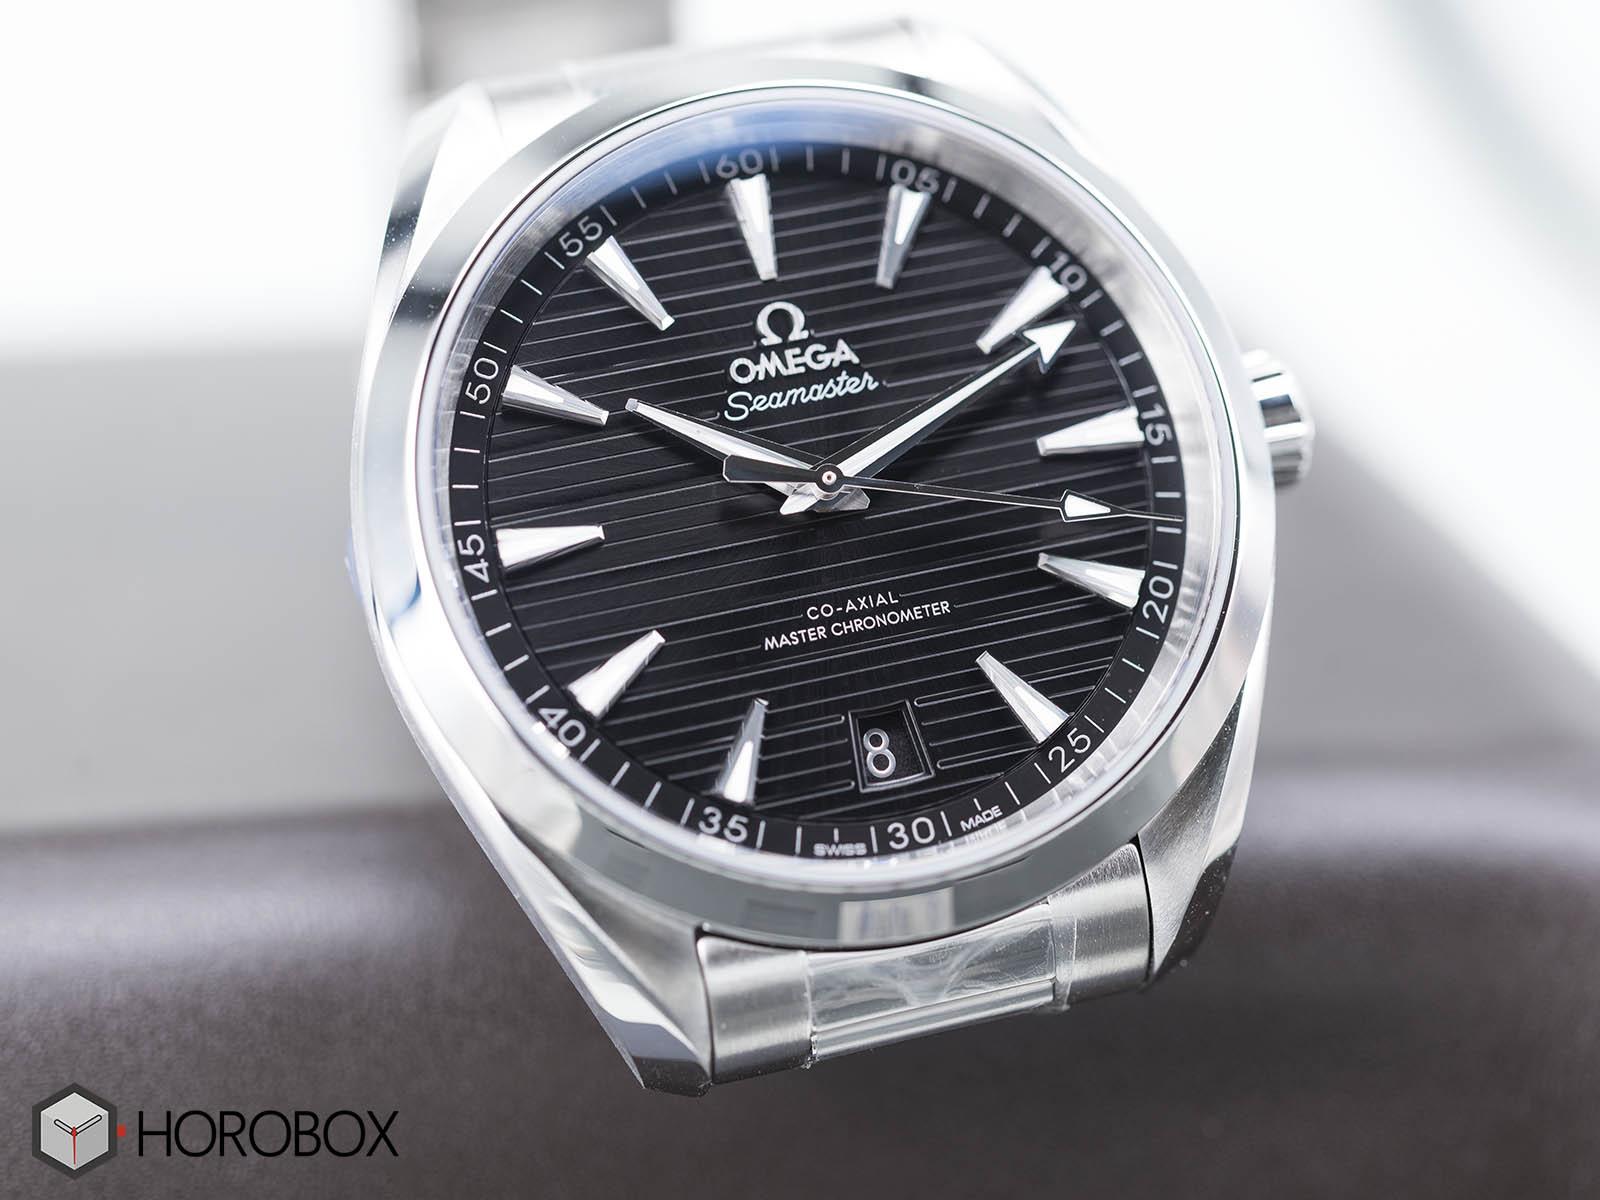 omega-seamaster-aqua-terra-150m-220-10-41-21-01-001-1-.jpg